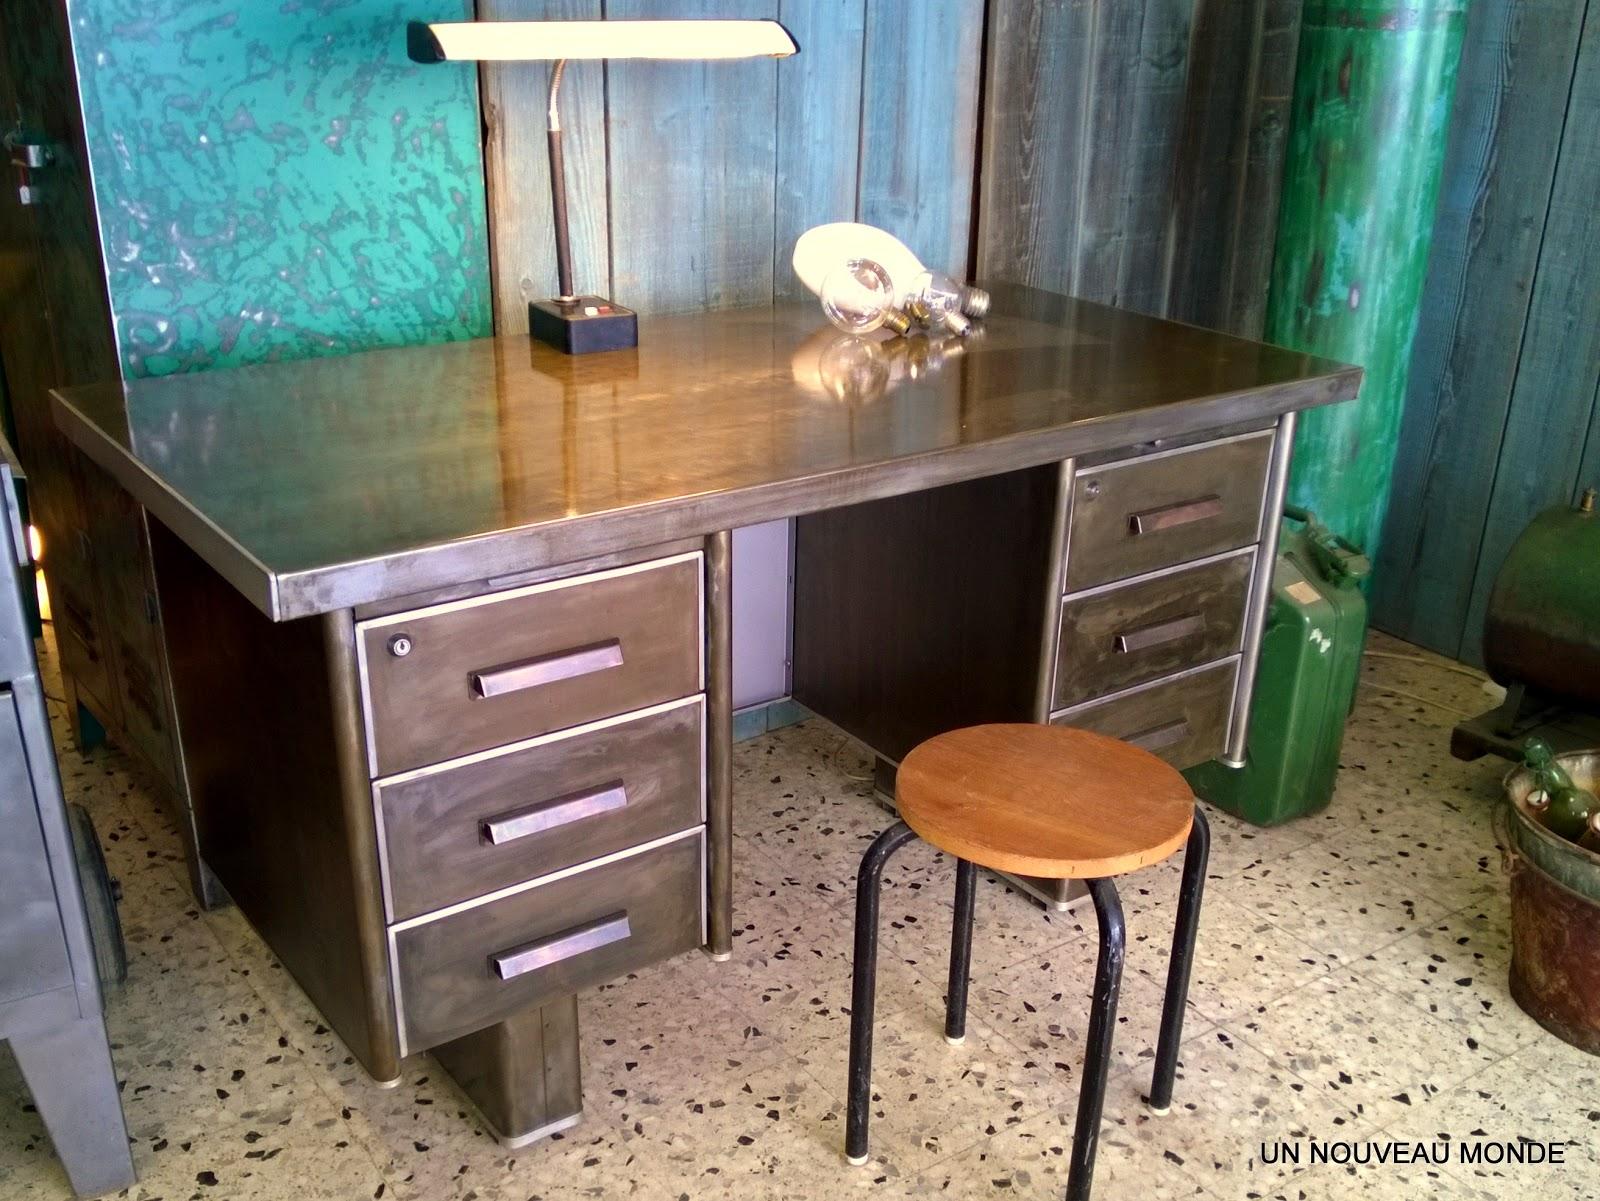 brocante d coration un nouveau monde bureau industriel. Black Bedroom Furniture Sets. Home Design Ideas